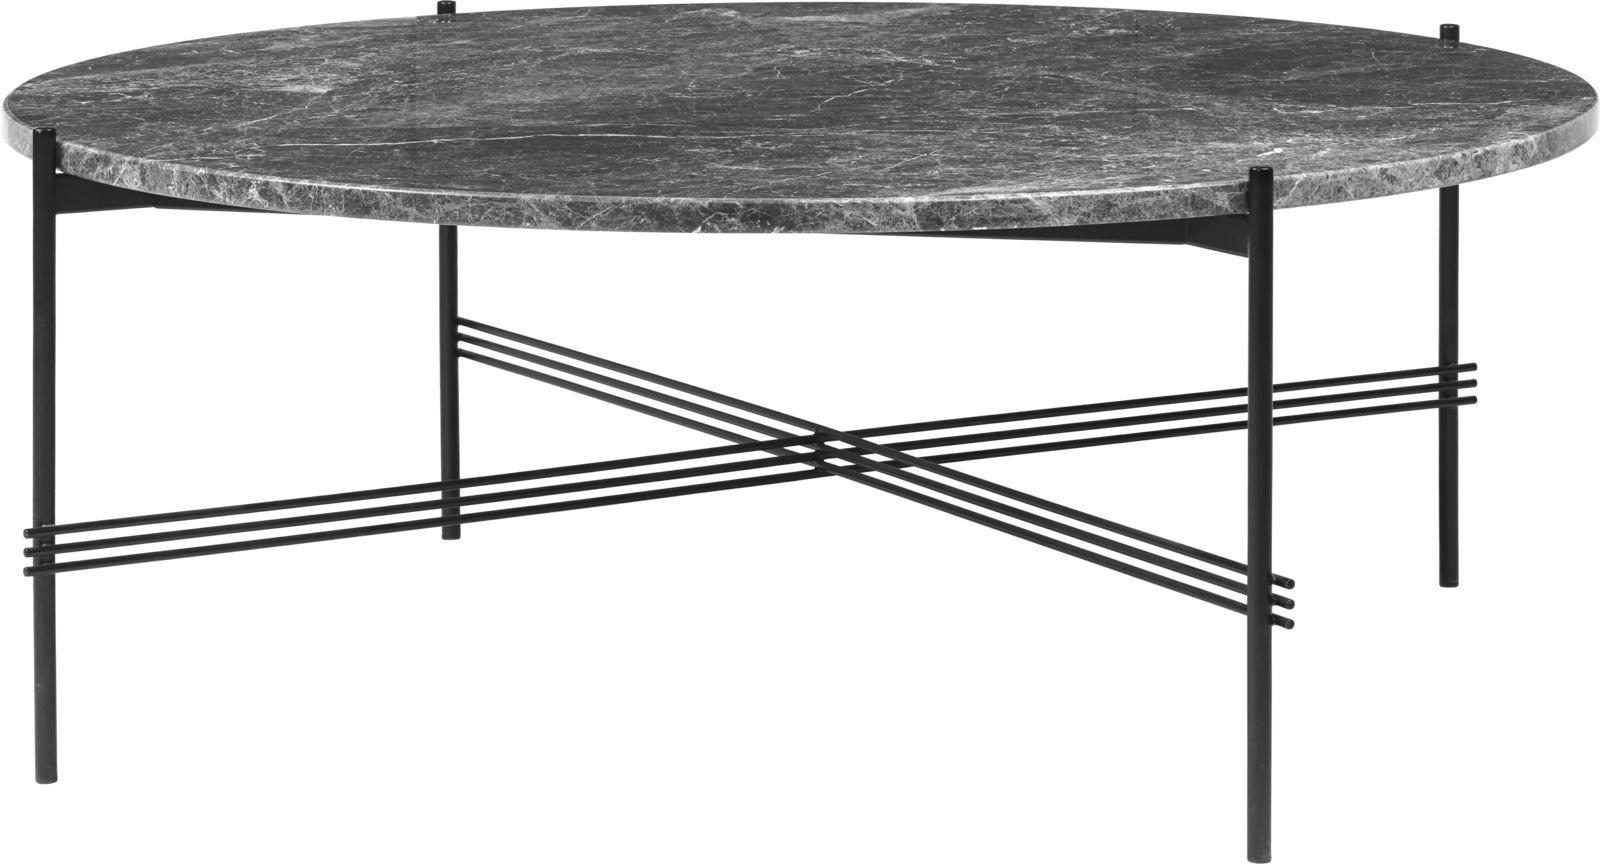 TS Round Coffee Table with Marble Top Gubi Marble Grey Emperador, Gubi Metal Black Matt, Ø 105 x H